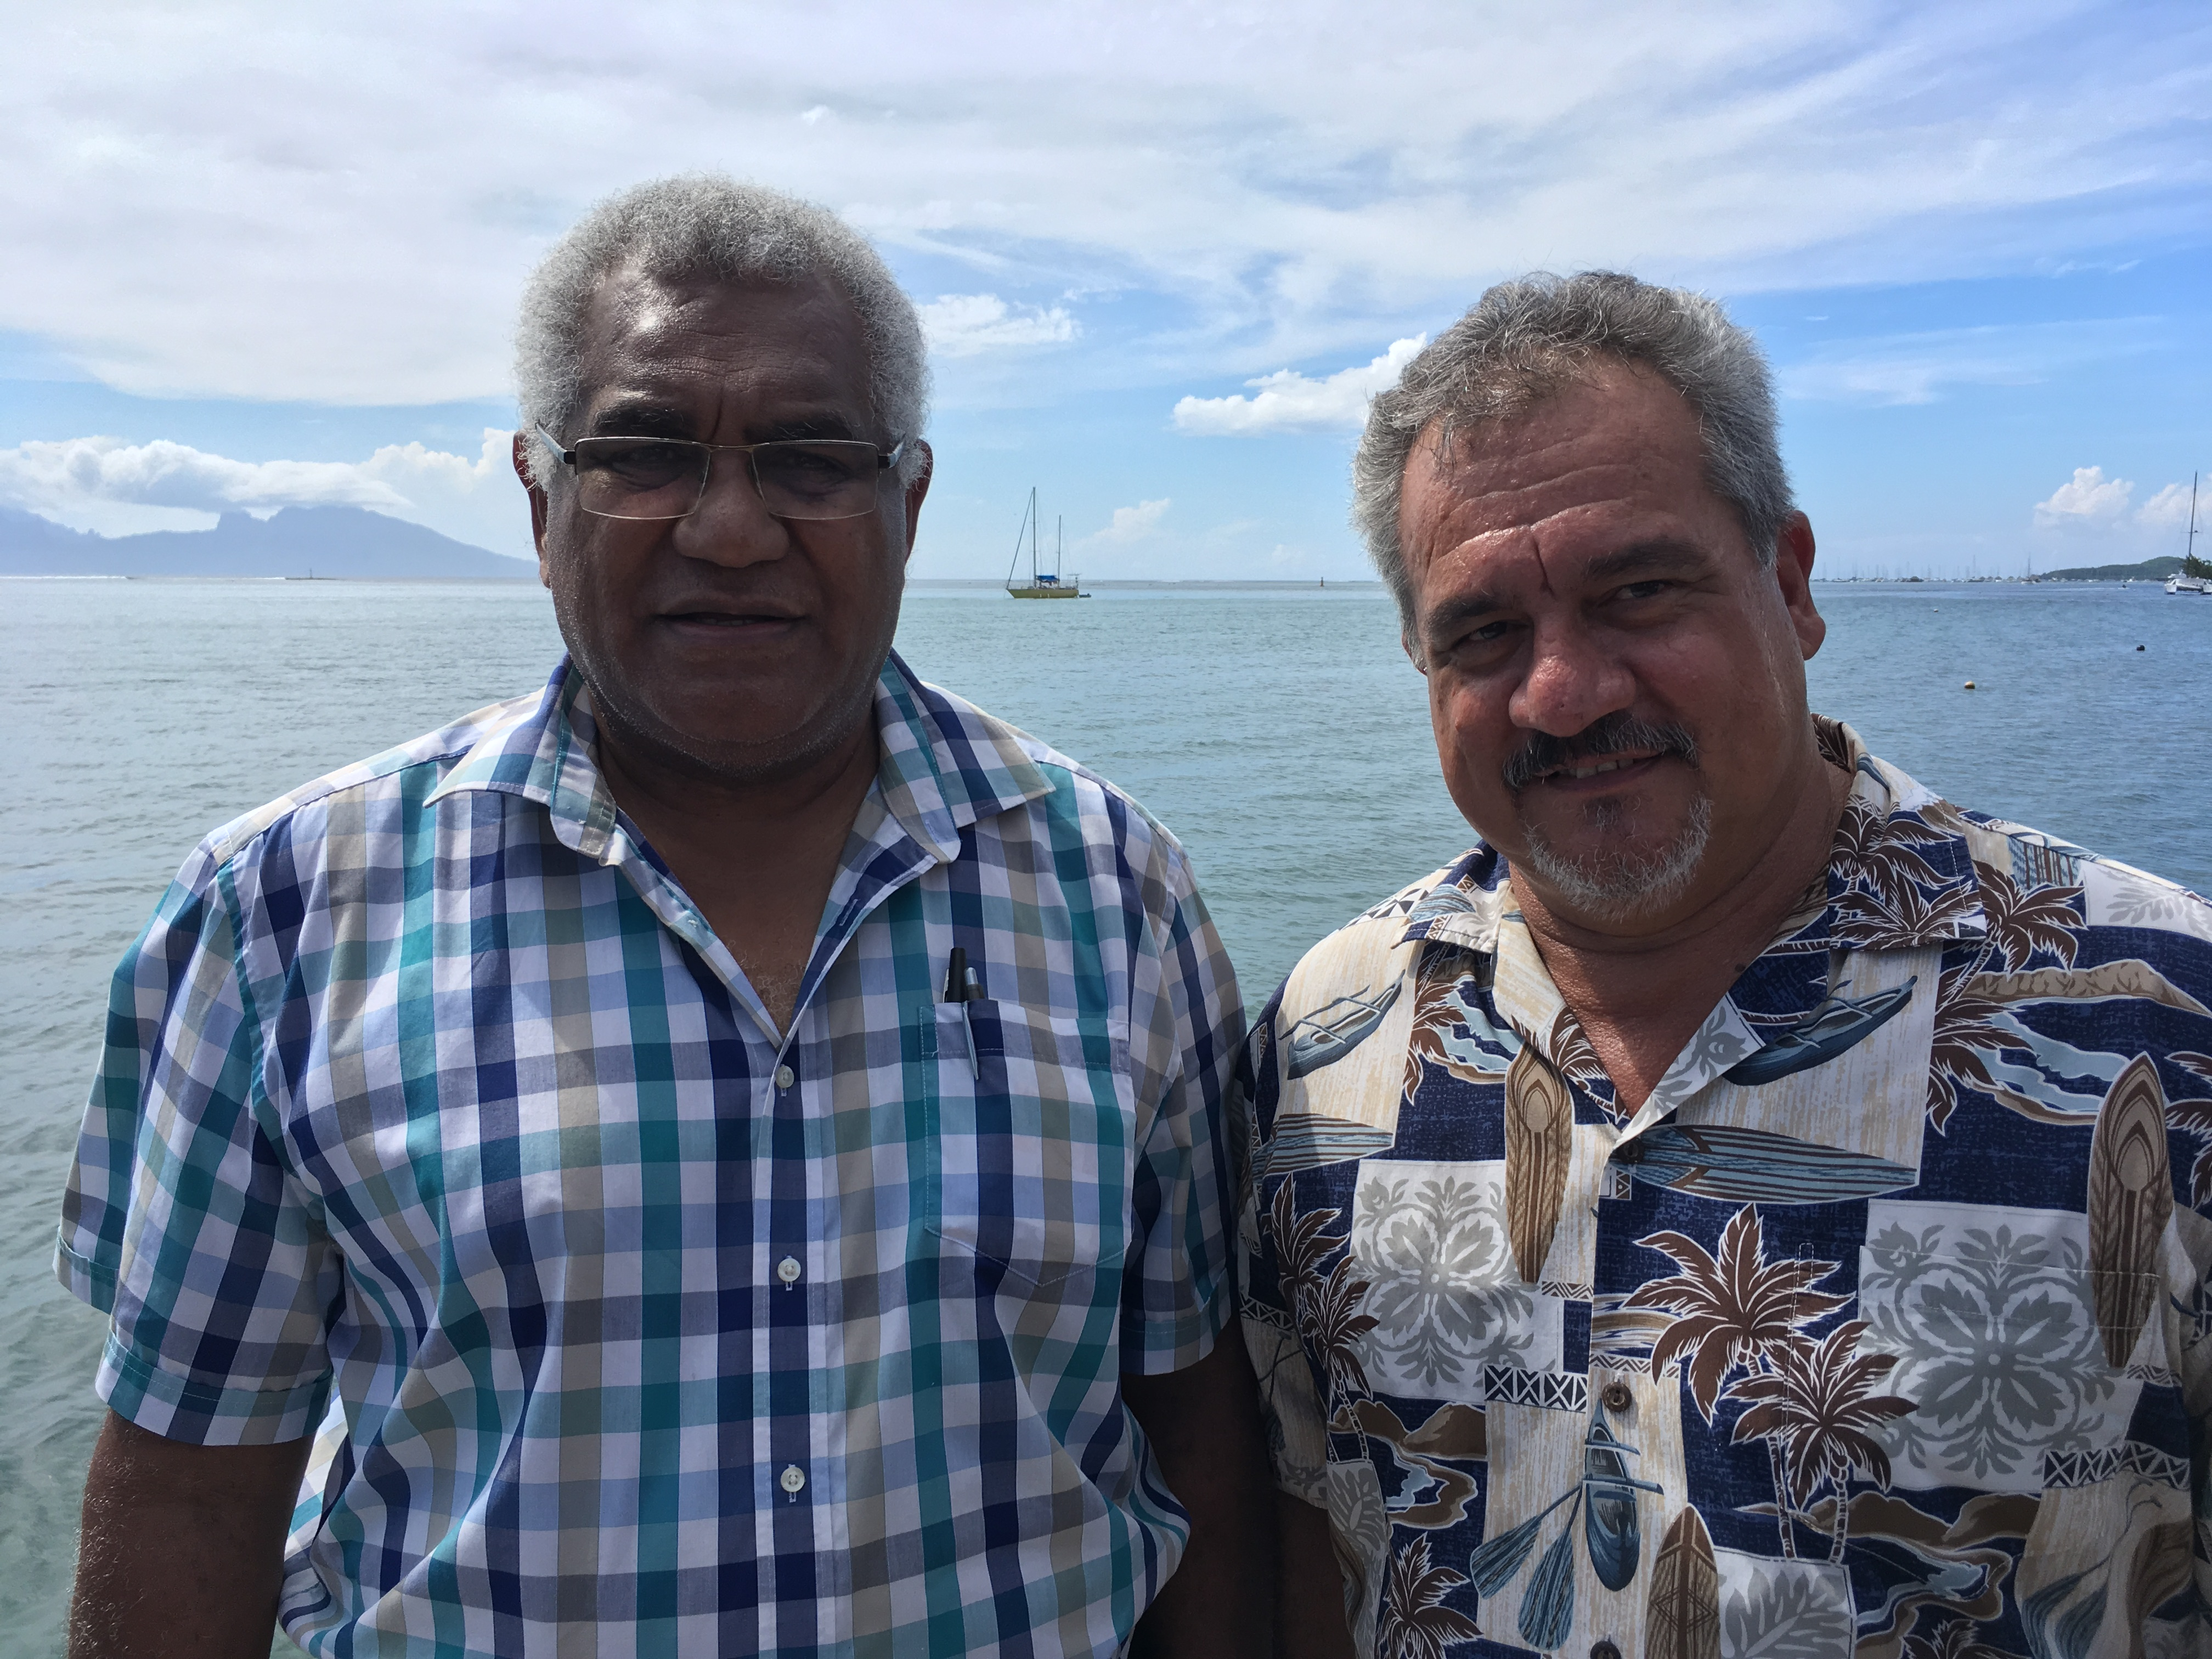 Walles Kotra et Heremoana Maamaatuaiahutapu - © Cédric Mal